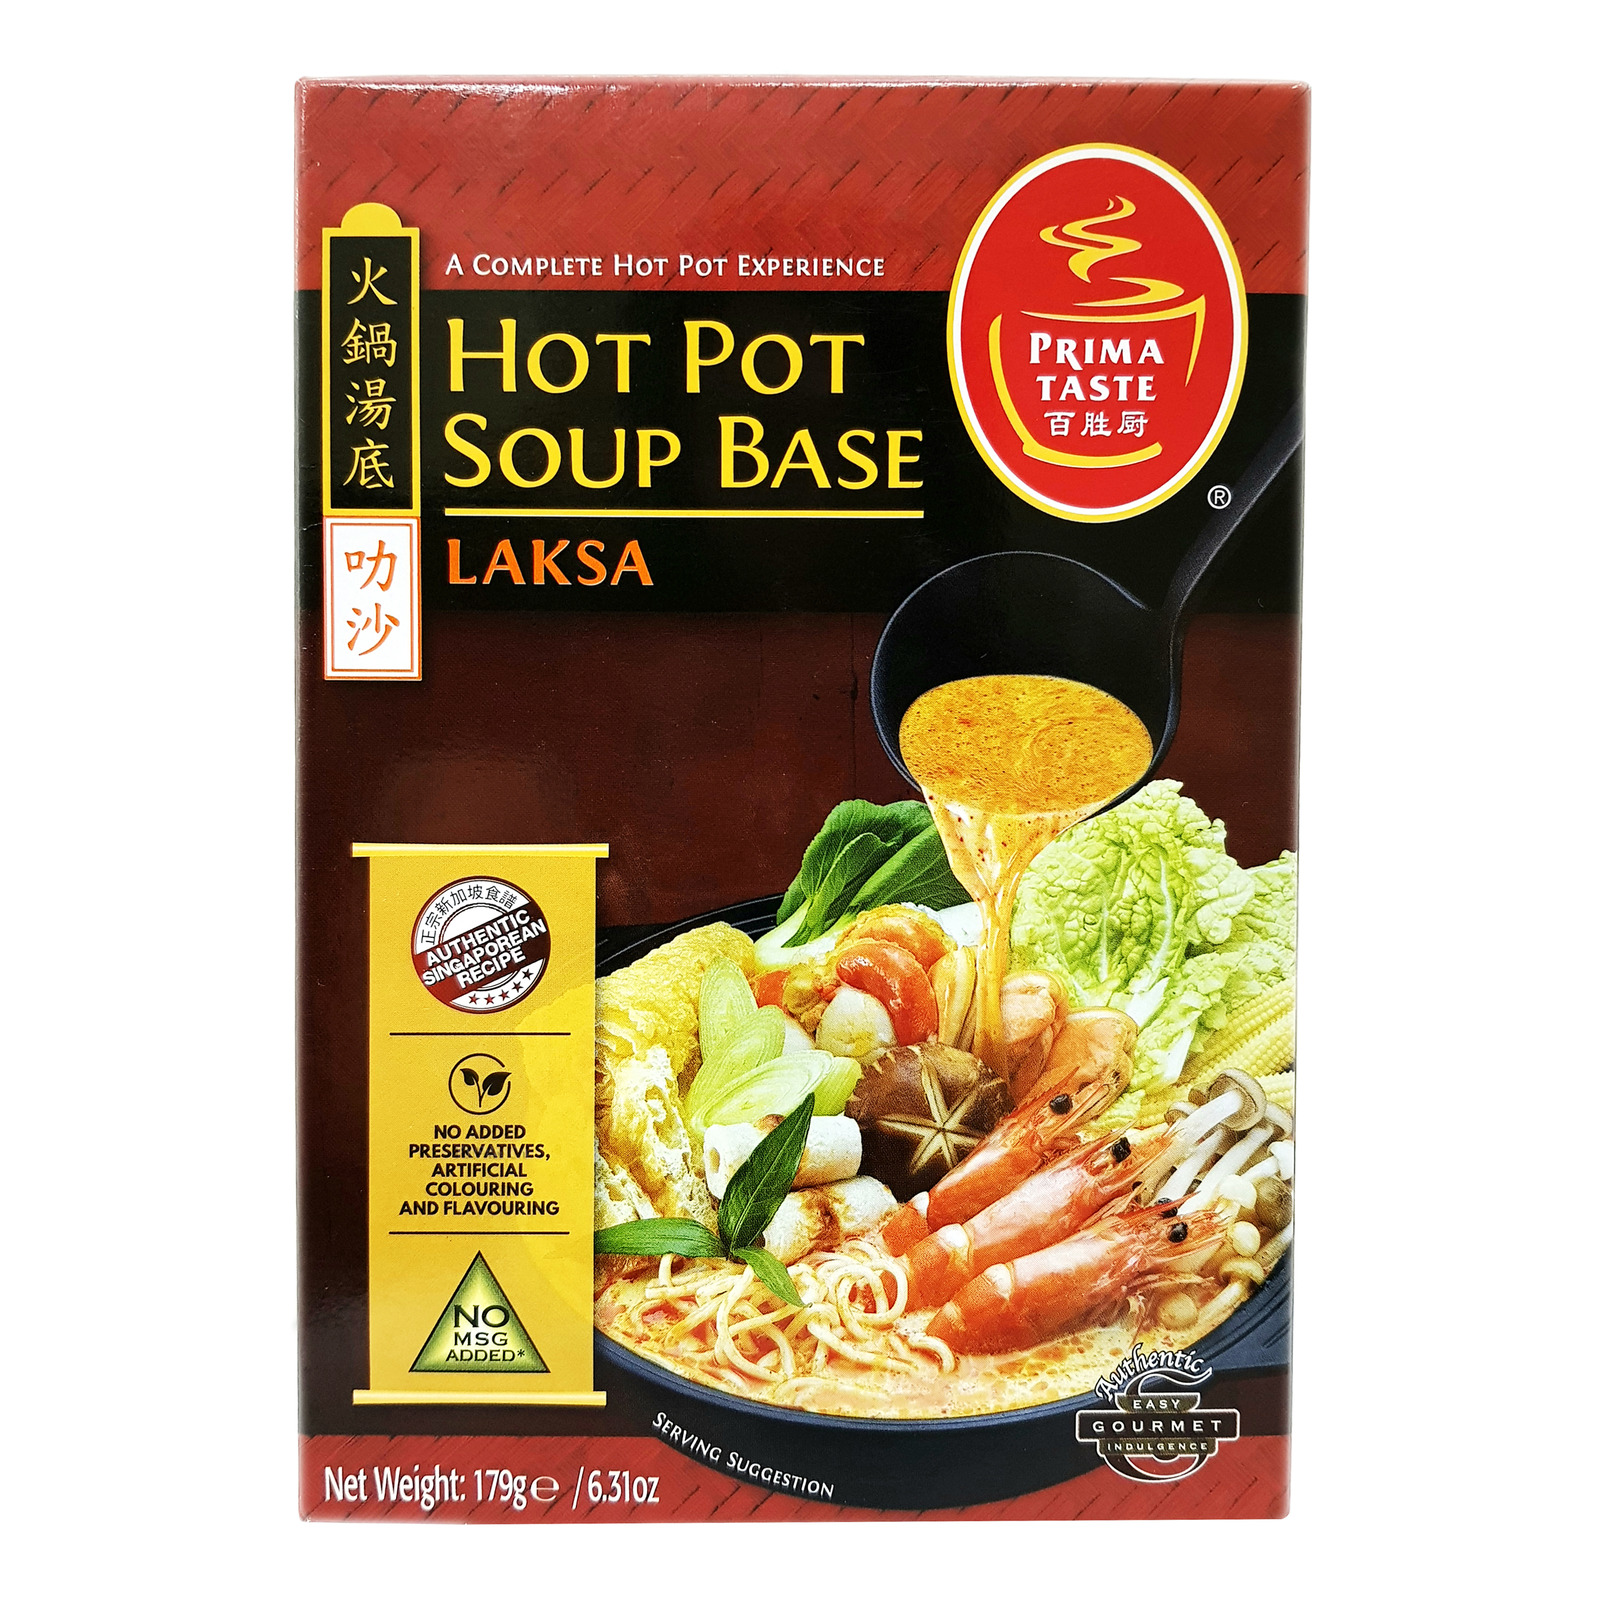 Prima Taste Hot Pot Soup Base - Laksa